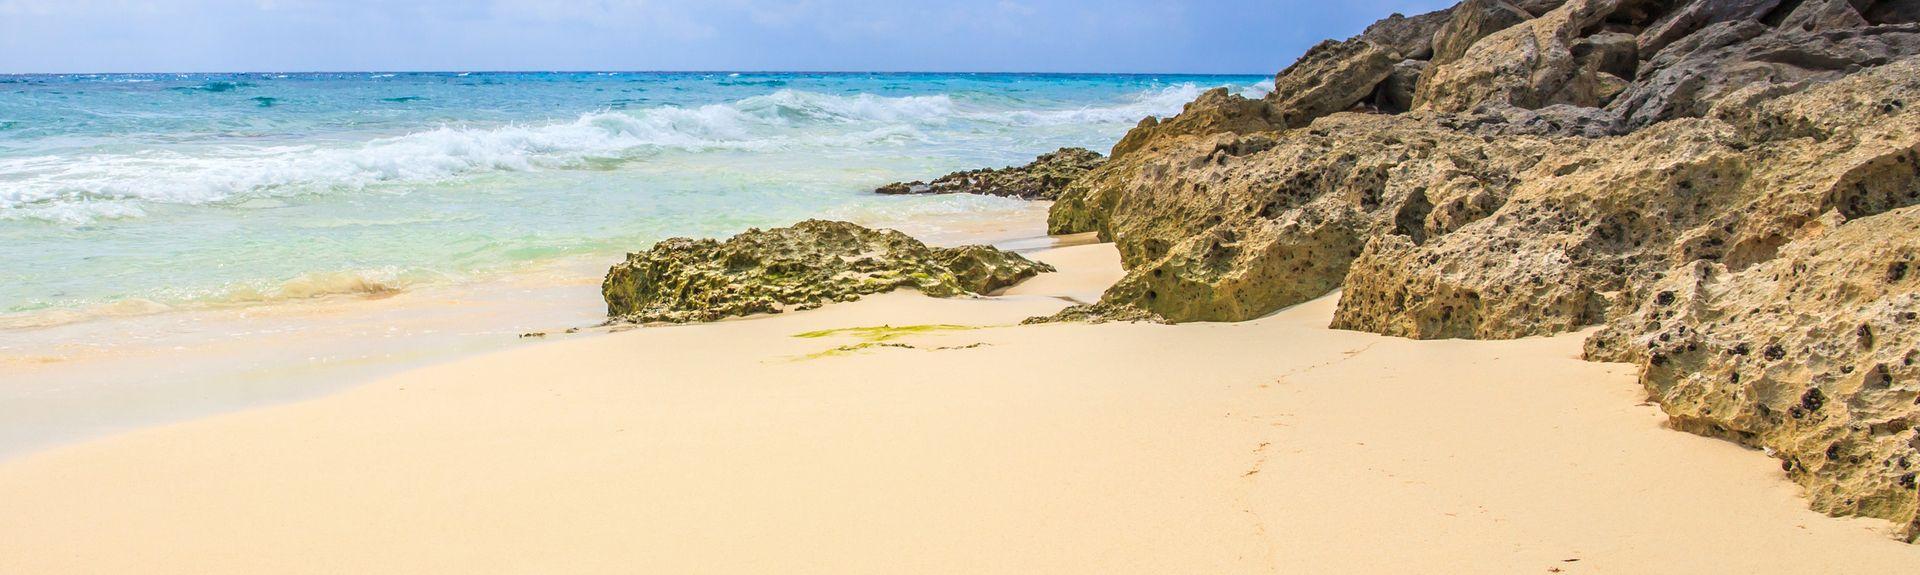 Playacar (Playa del Carmen, Quintana Roo, Mexico)